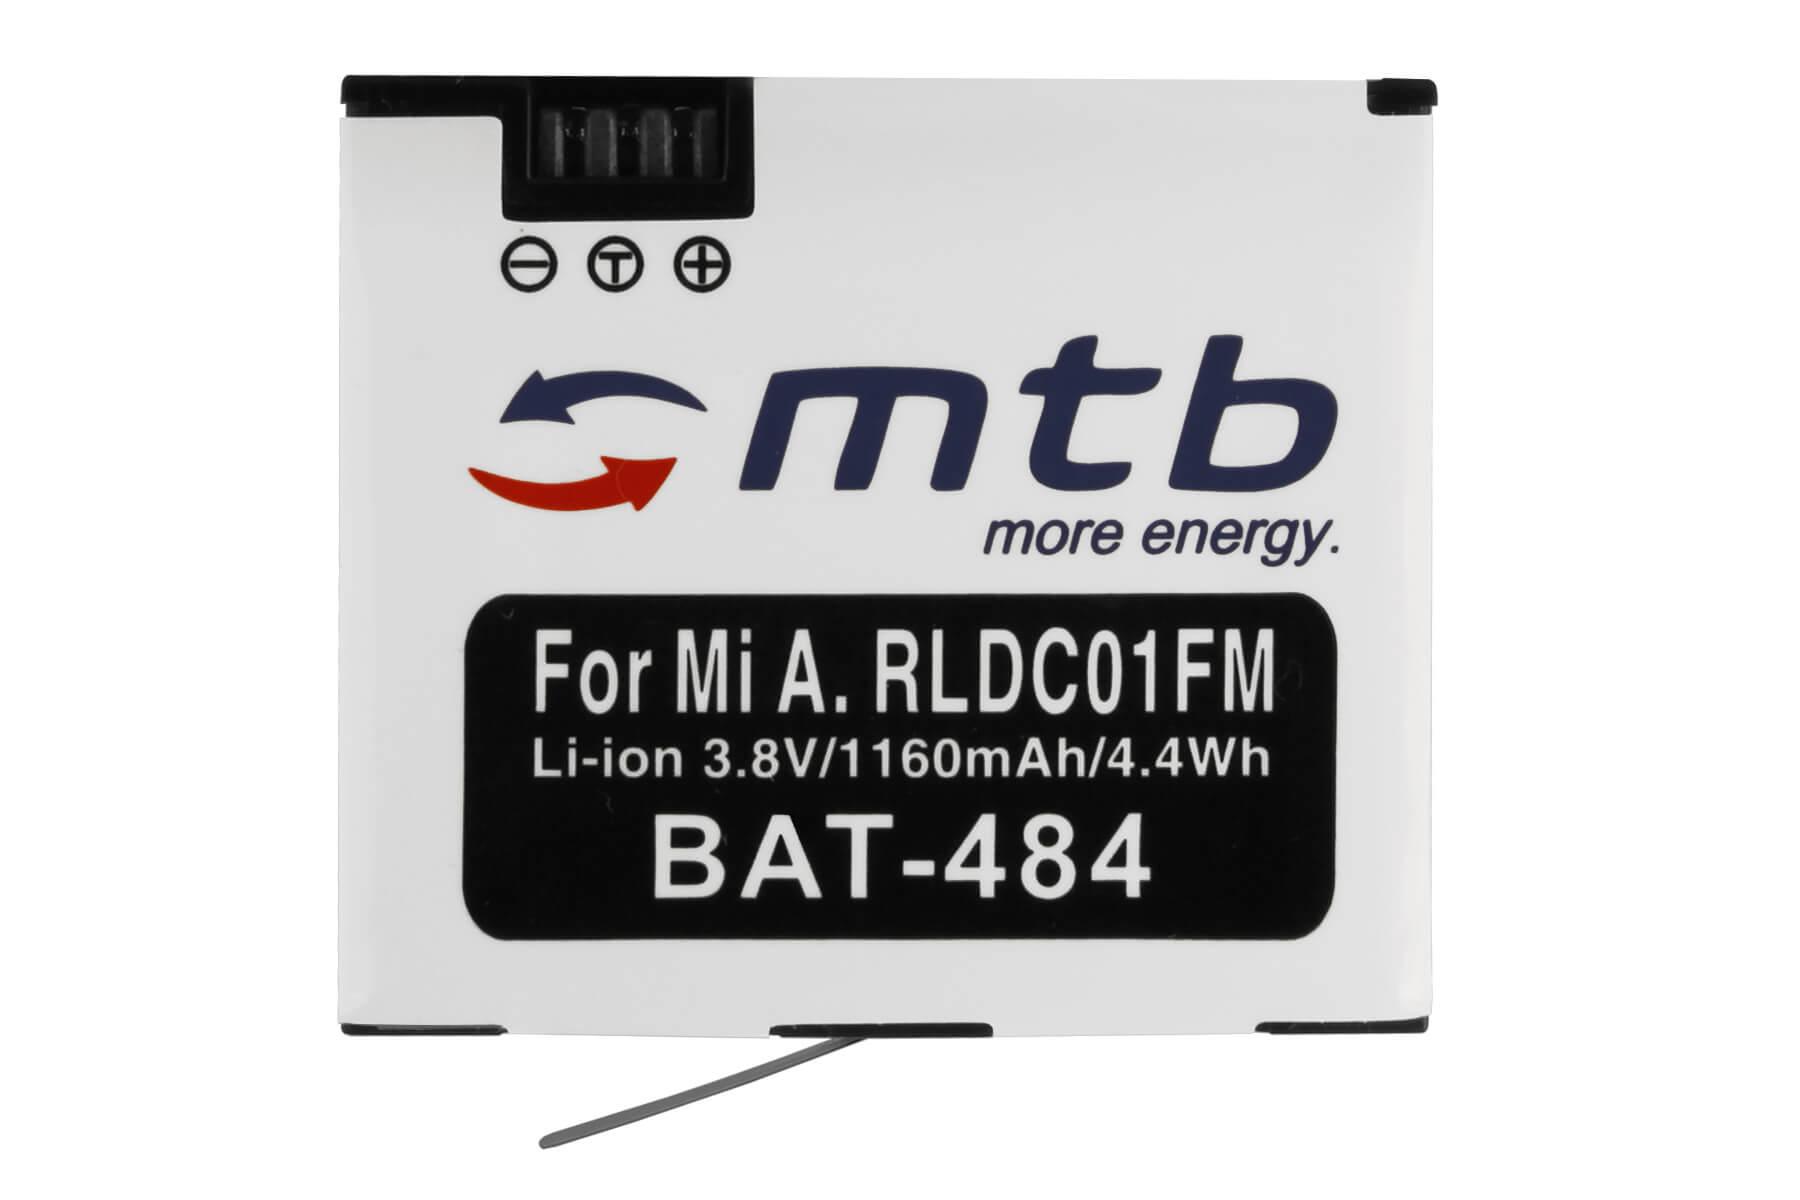 Bateria para Xiaomi Mijia Kamera Mini 4K YDXJ01FM RLDC01FM